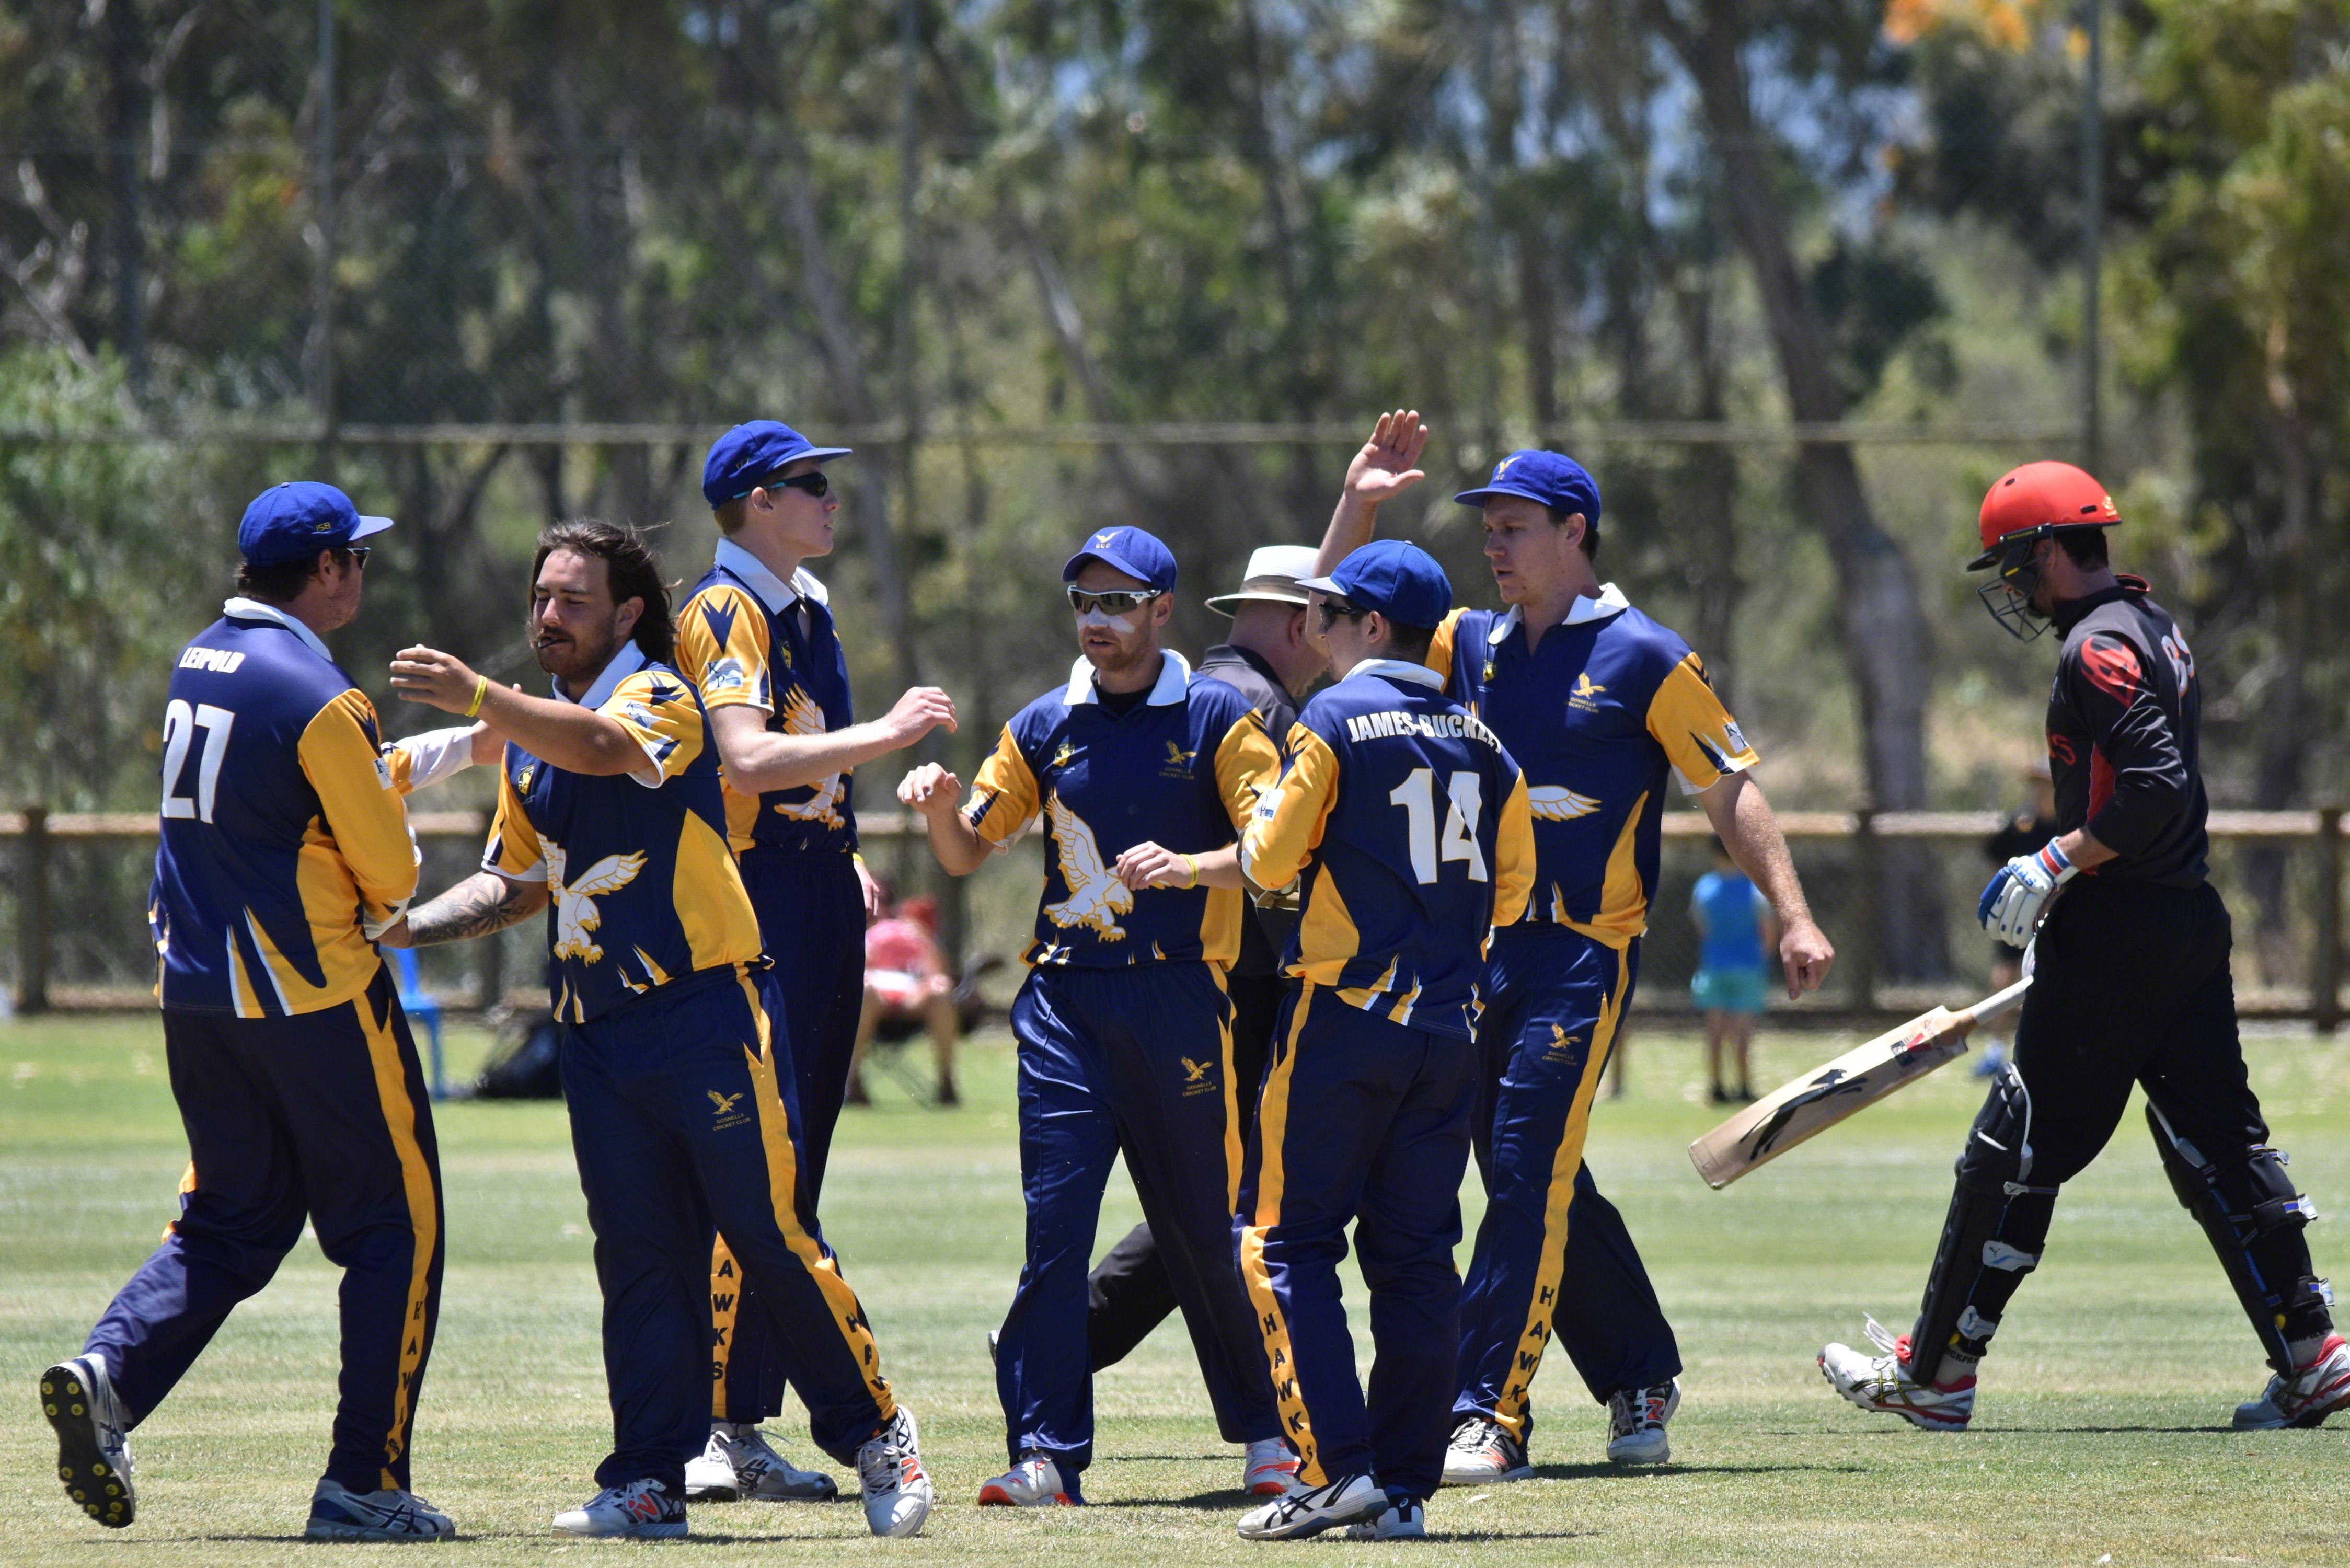 University celebrate a wicket against Gosnells in the T20 semi final.